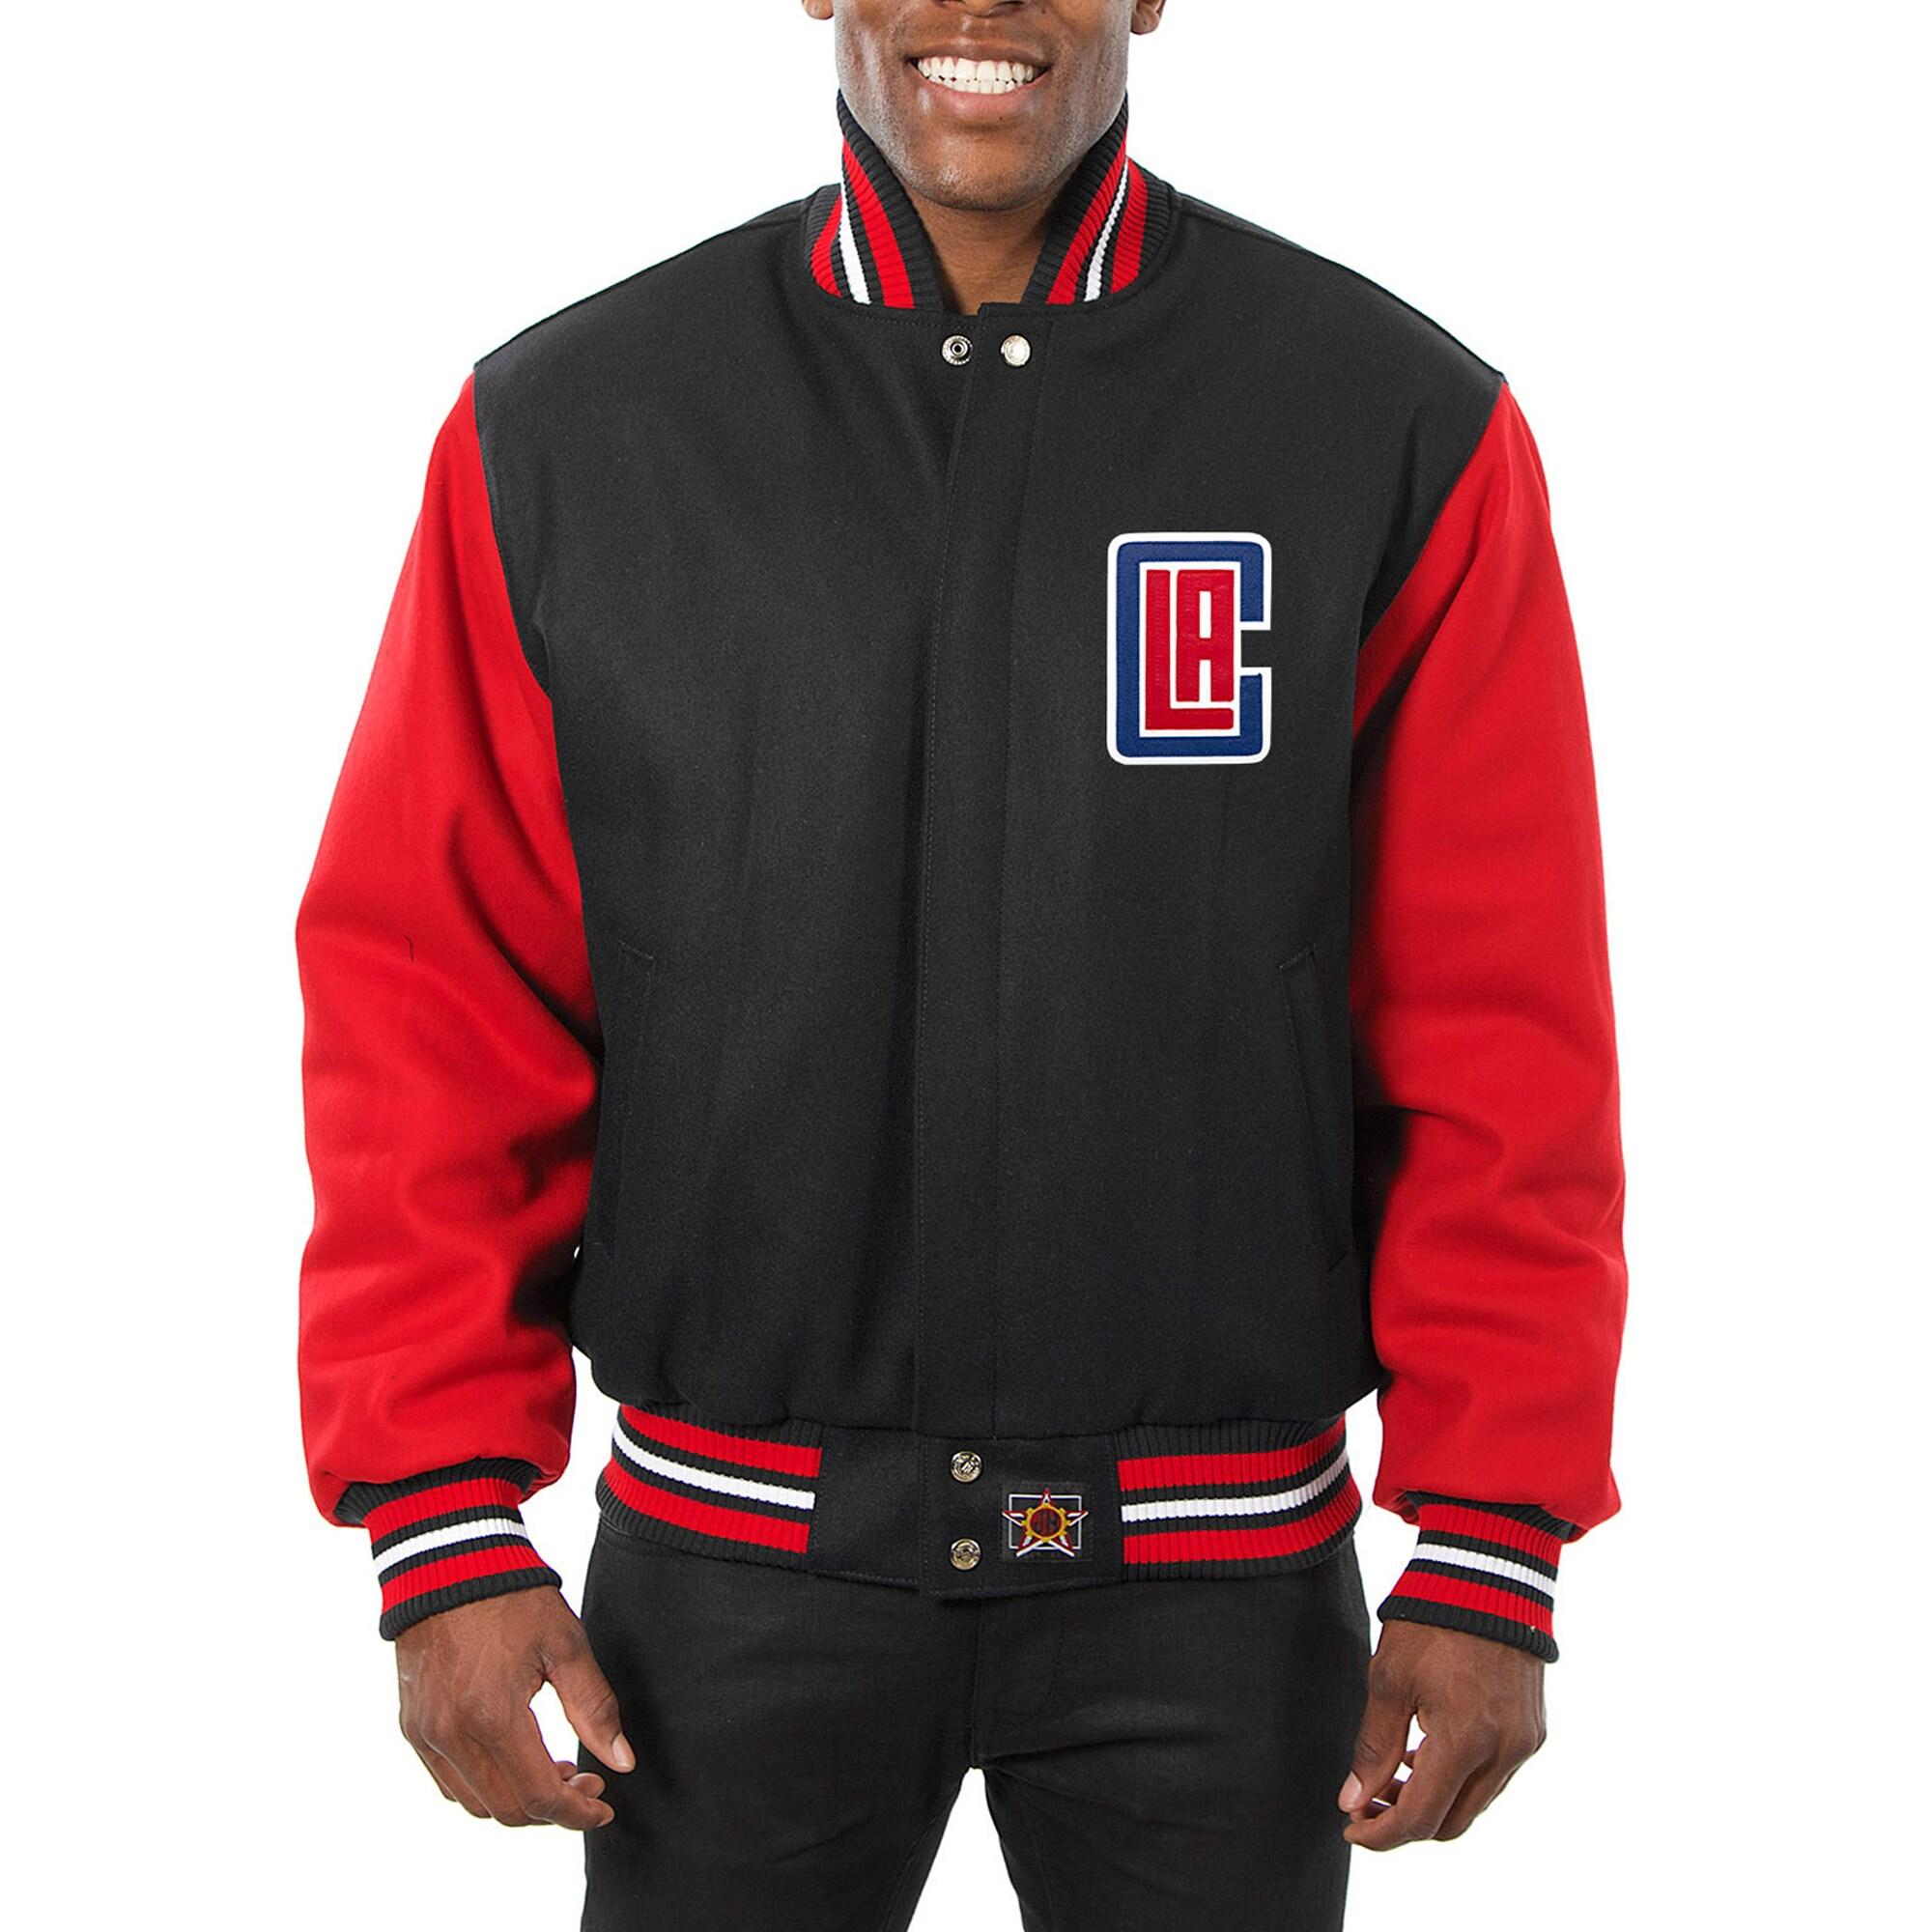 LA Clippers JH Design Domestic Two-Tone Wool Jacket - Black